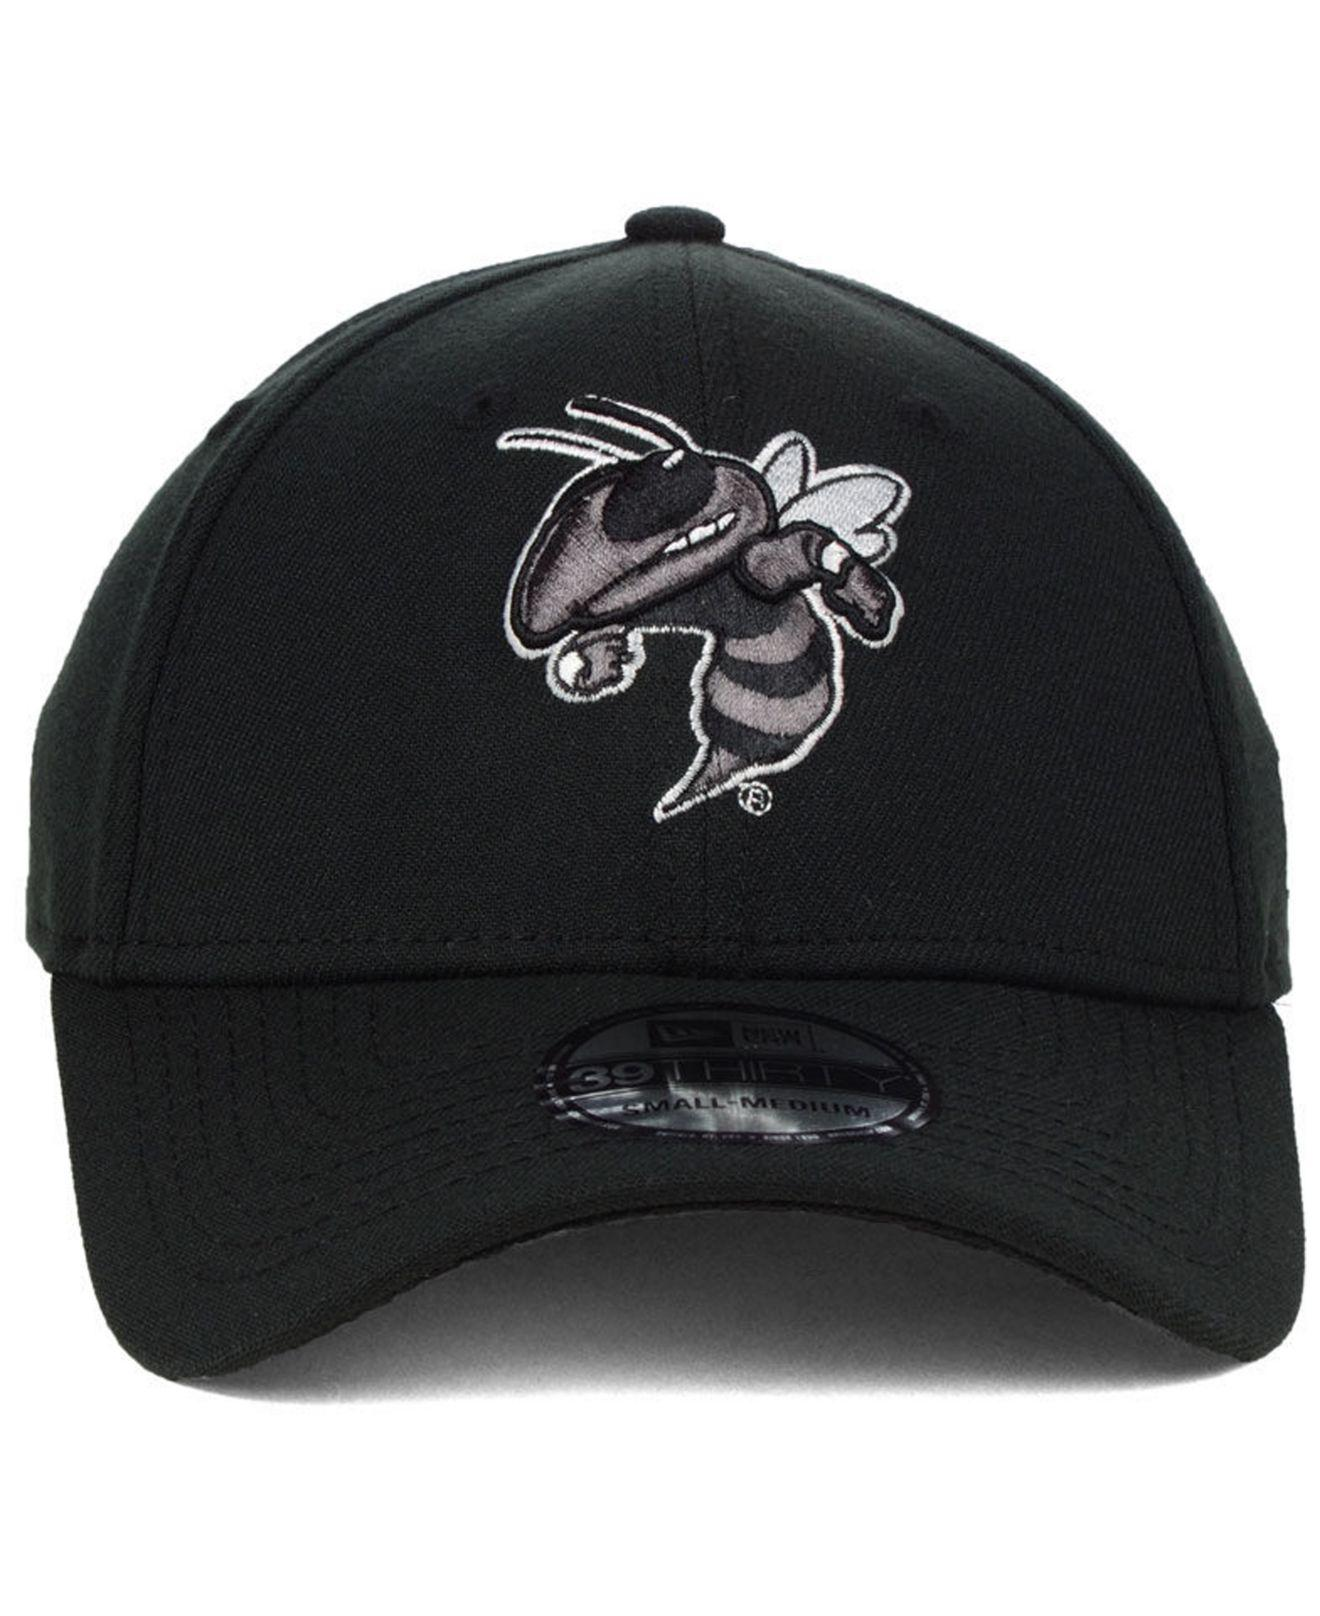 on sale 917ec 15a6c ... discount code for lyst ktz georgia tech black pop flex 39thirty cap in  black for men